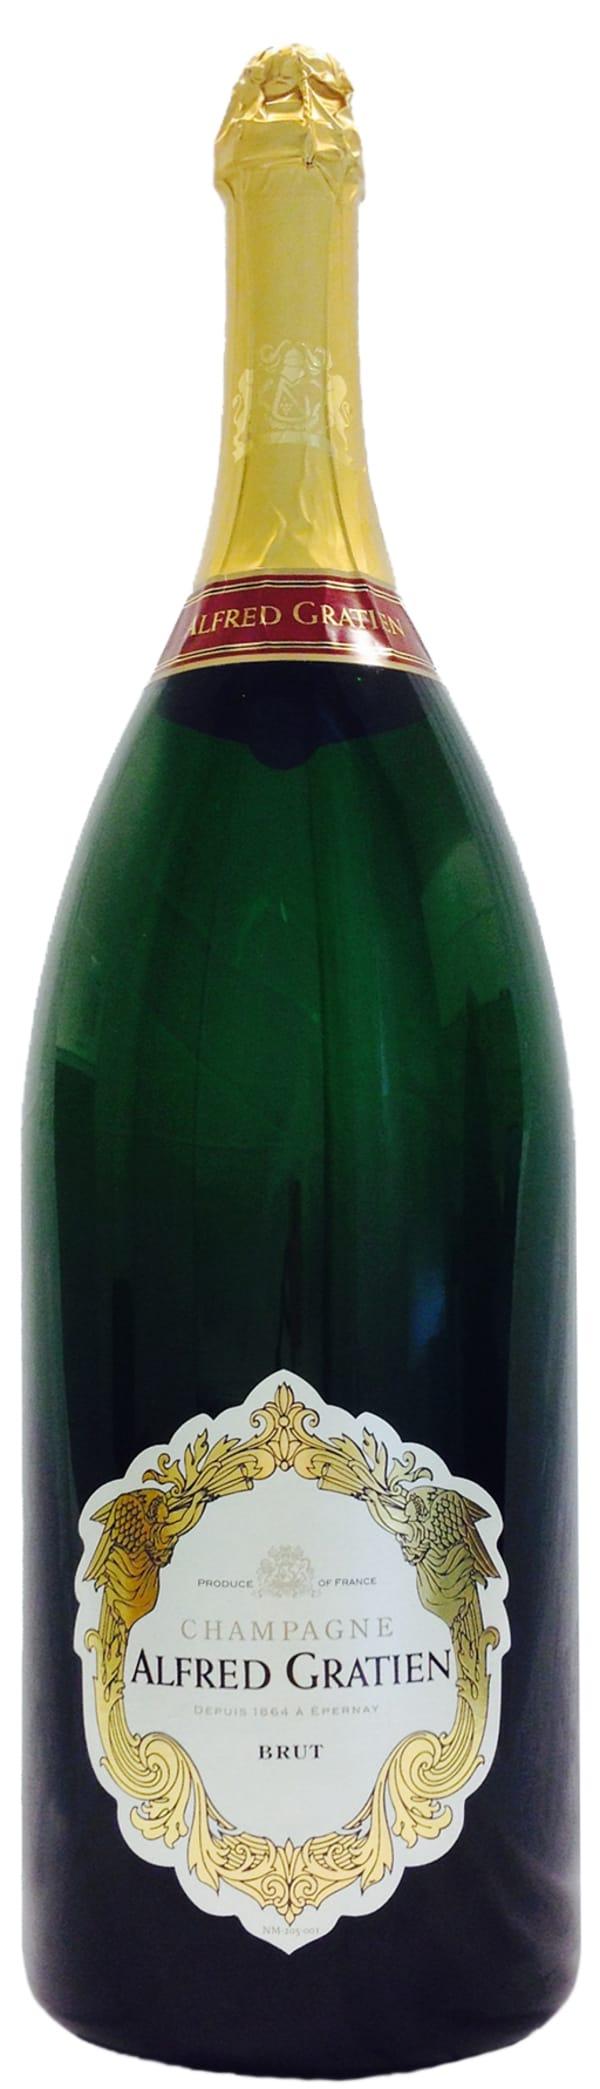 Alfred Gratien Champagne Brut Salmanazar